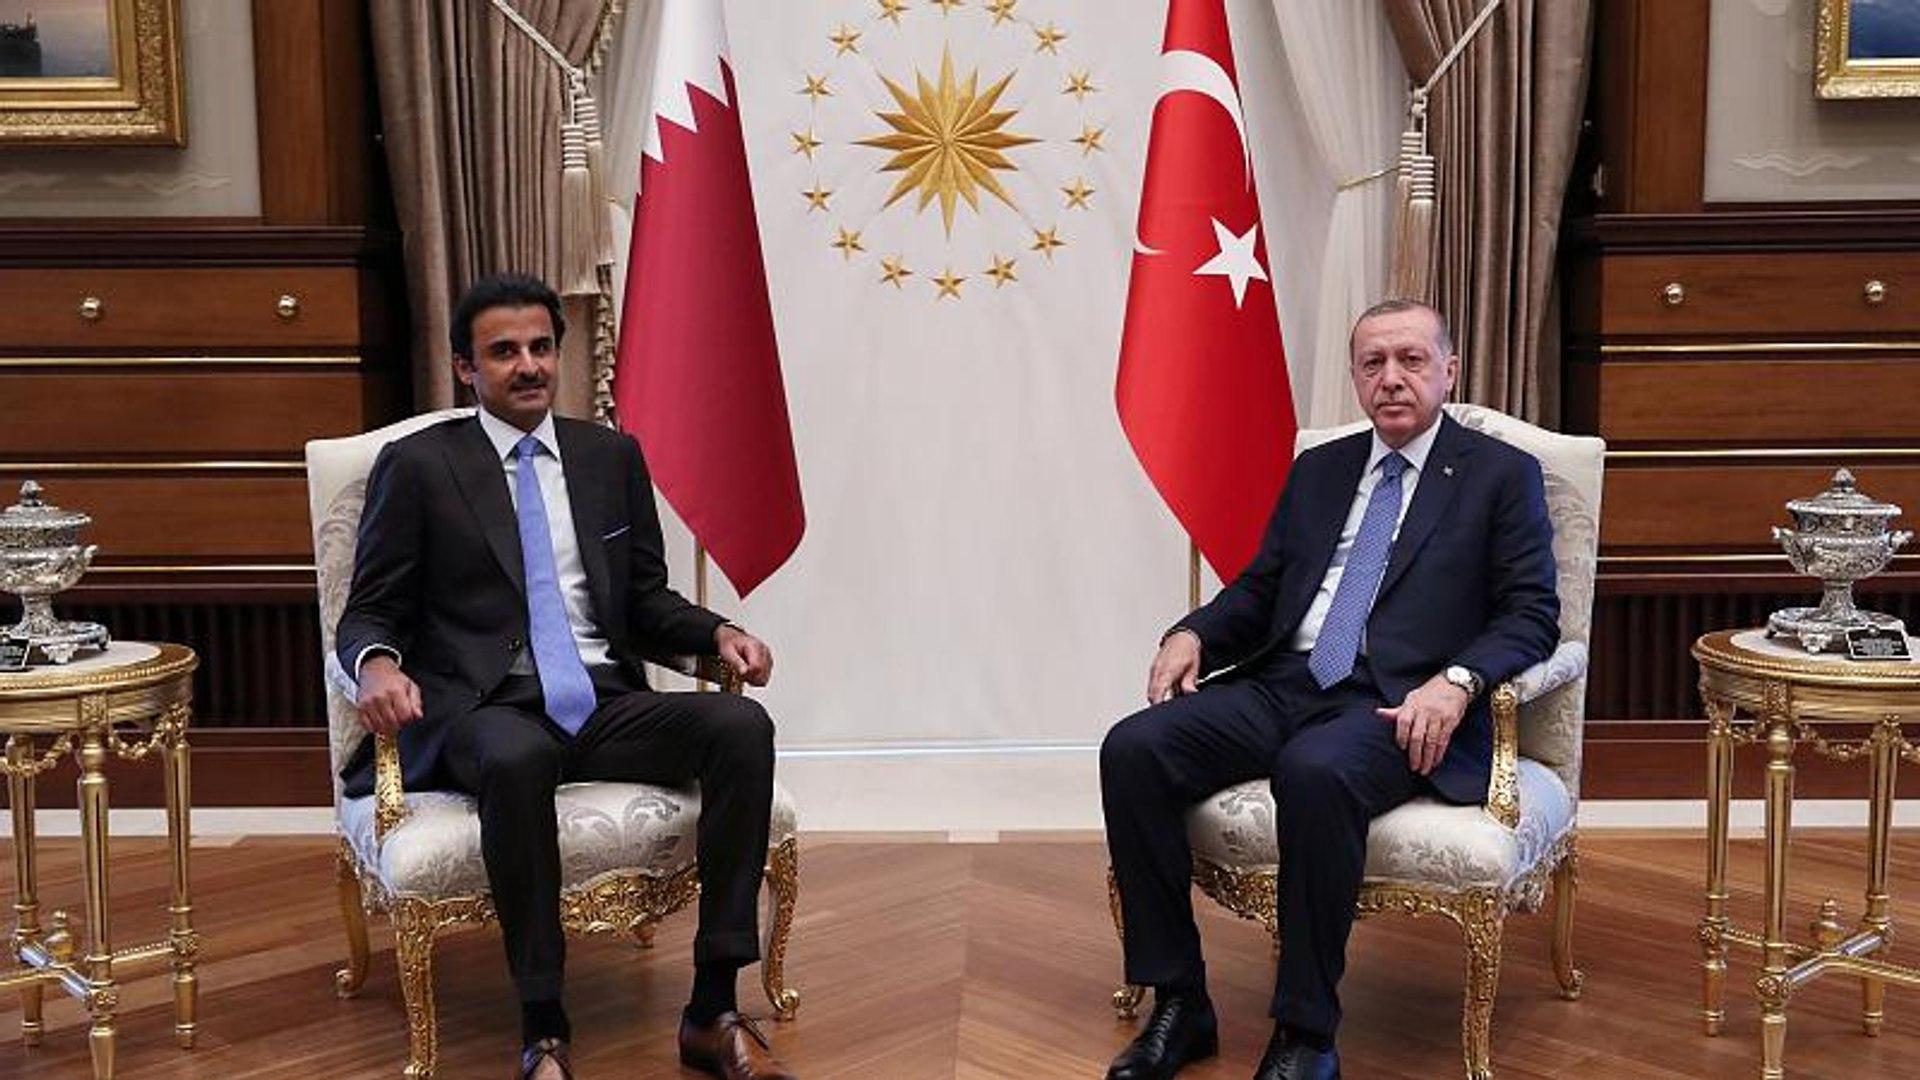 Turchia: da Qatar 15 miliardi dollari d'investimenti nel Paese